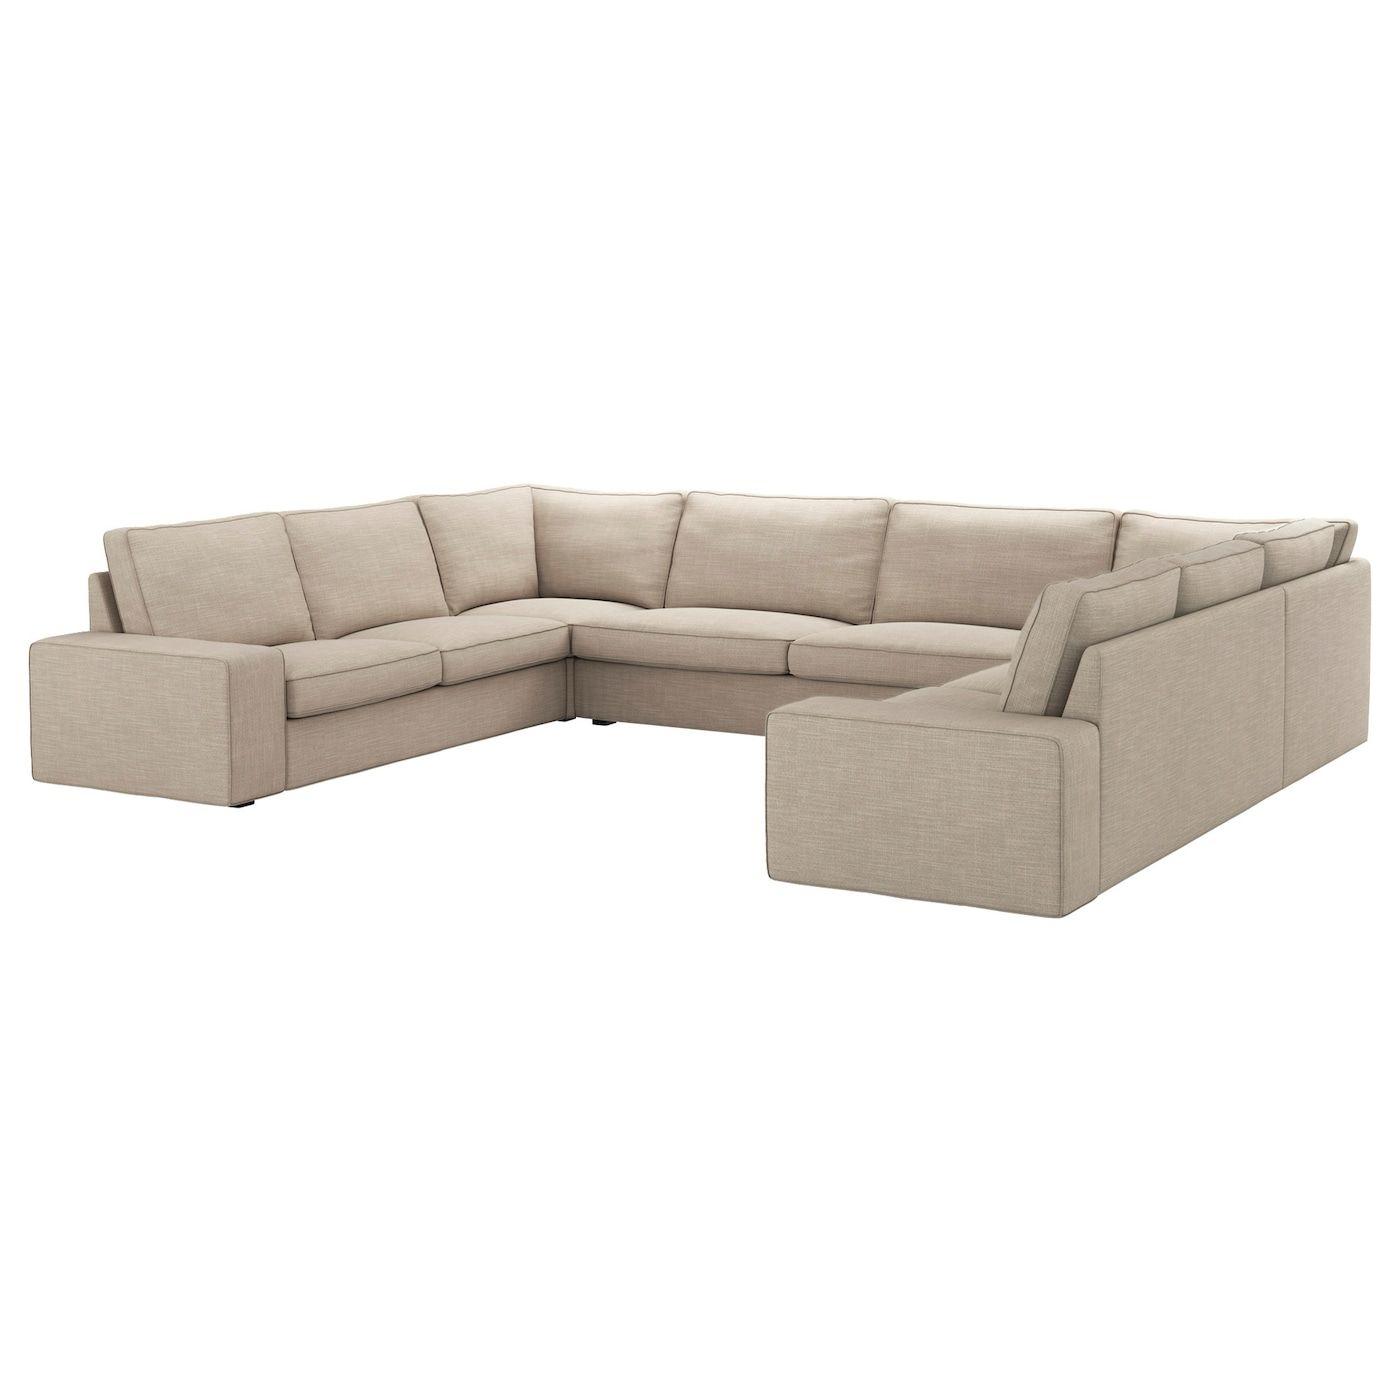 Kivik Sectional 6 Seat Hillared Beige In 2020 Beige Sofa U